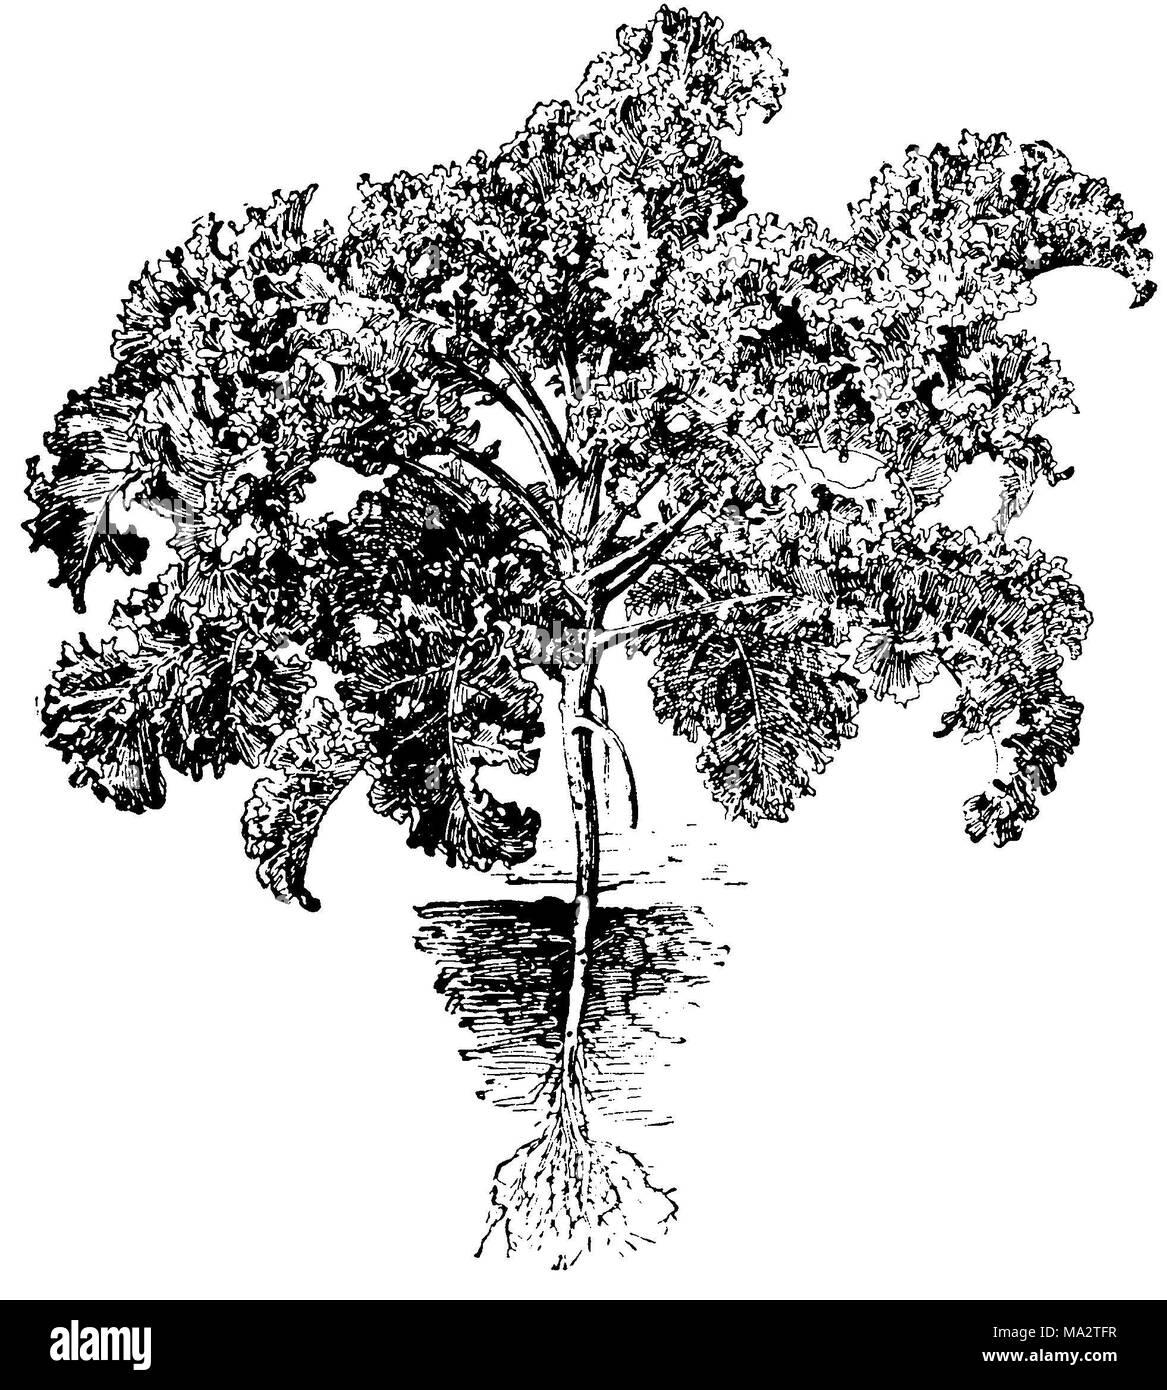 Kale or leaf cabbage - Stock Image